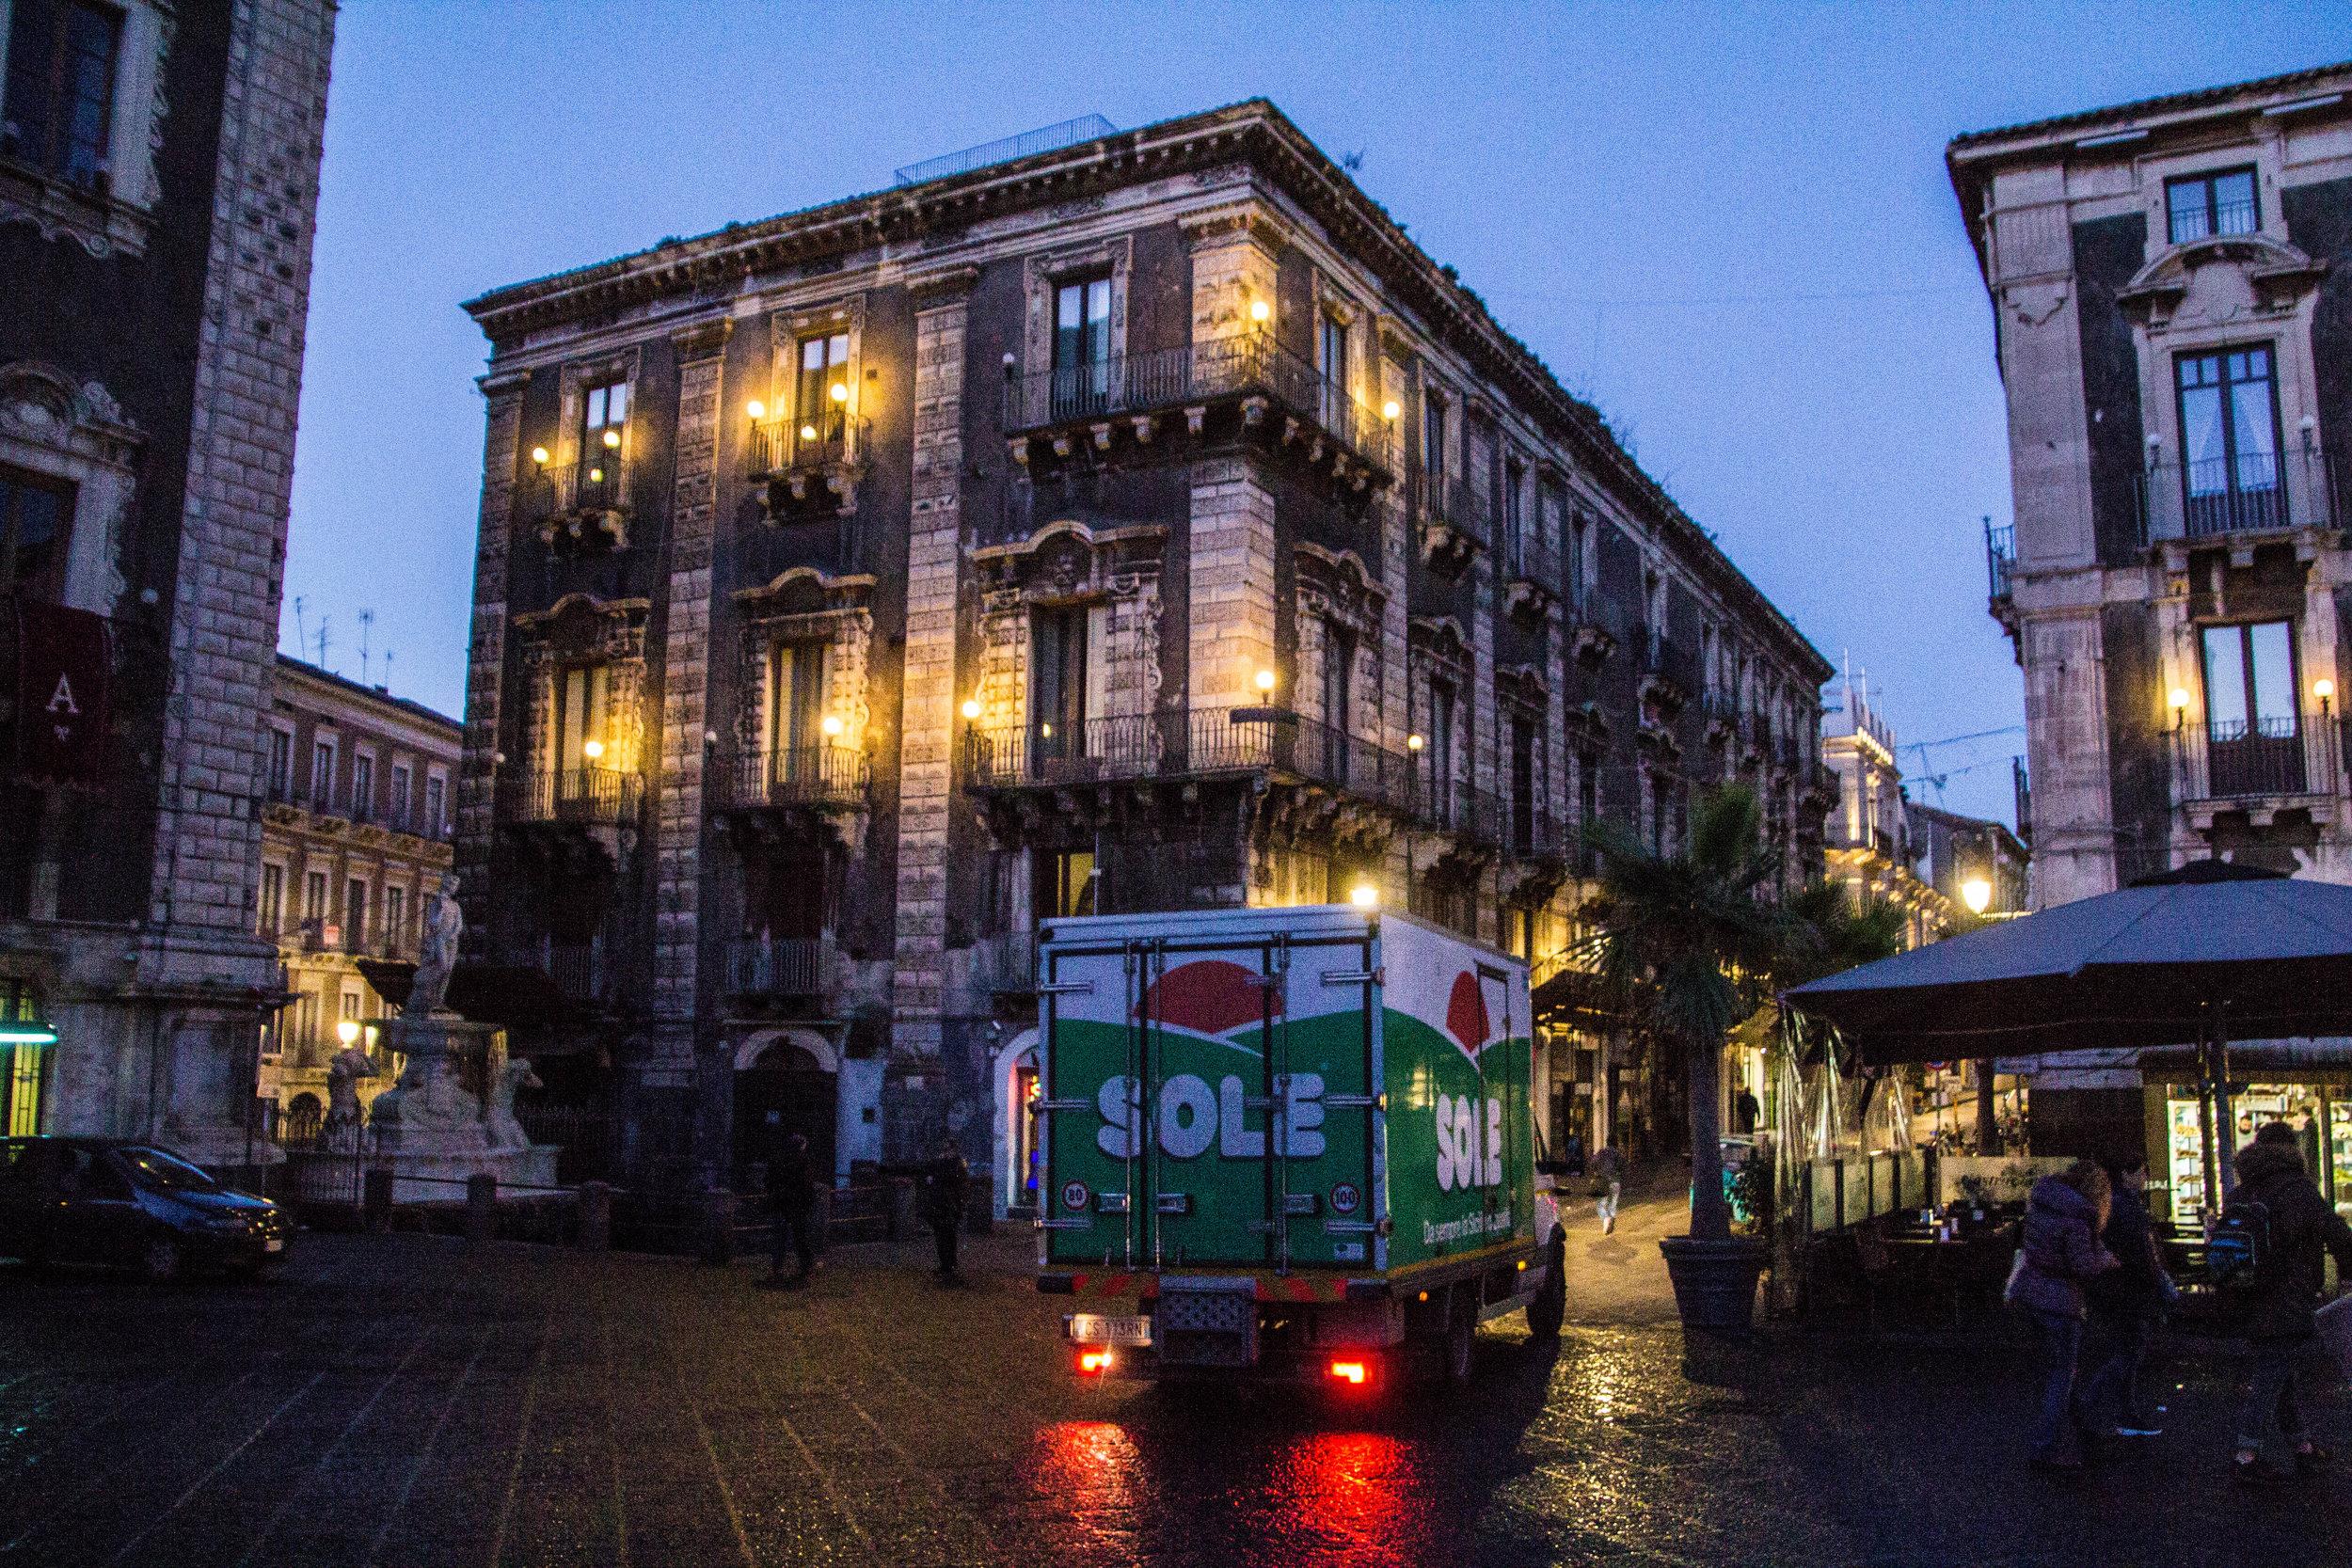 piazza-duomo-catania-sicily-1.jpg